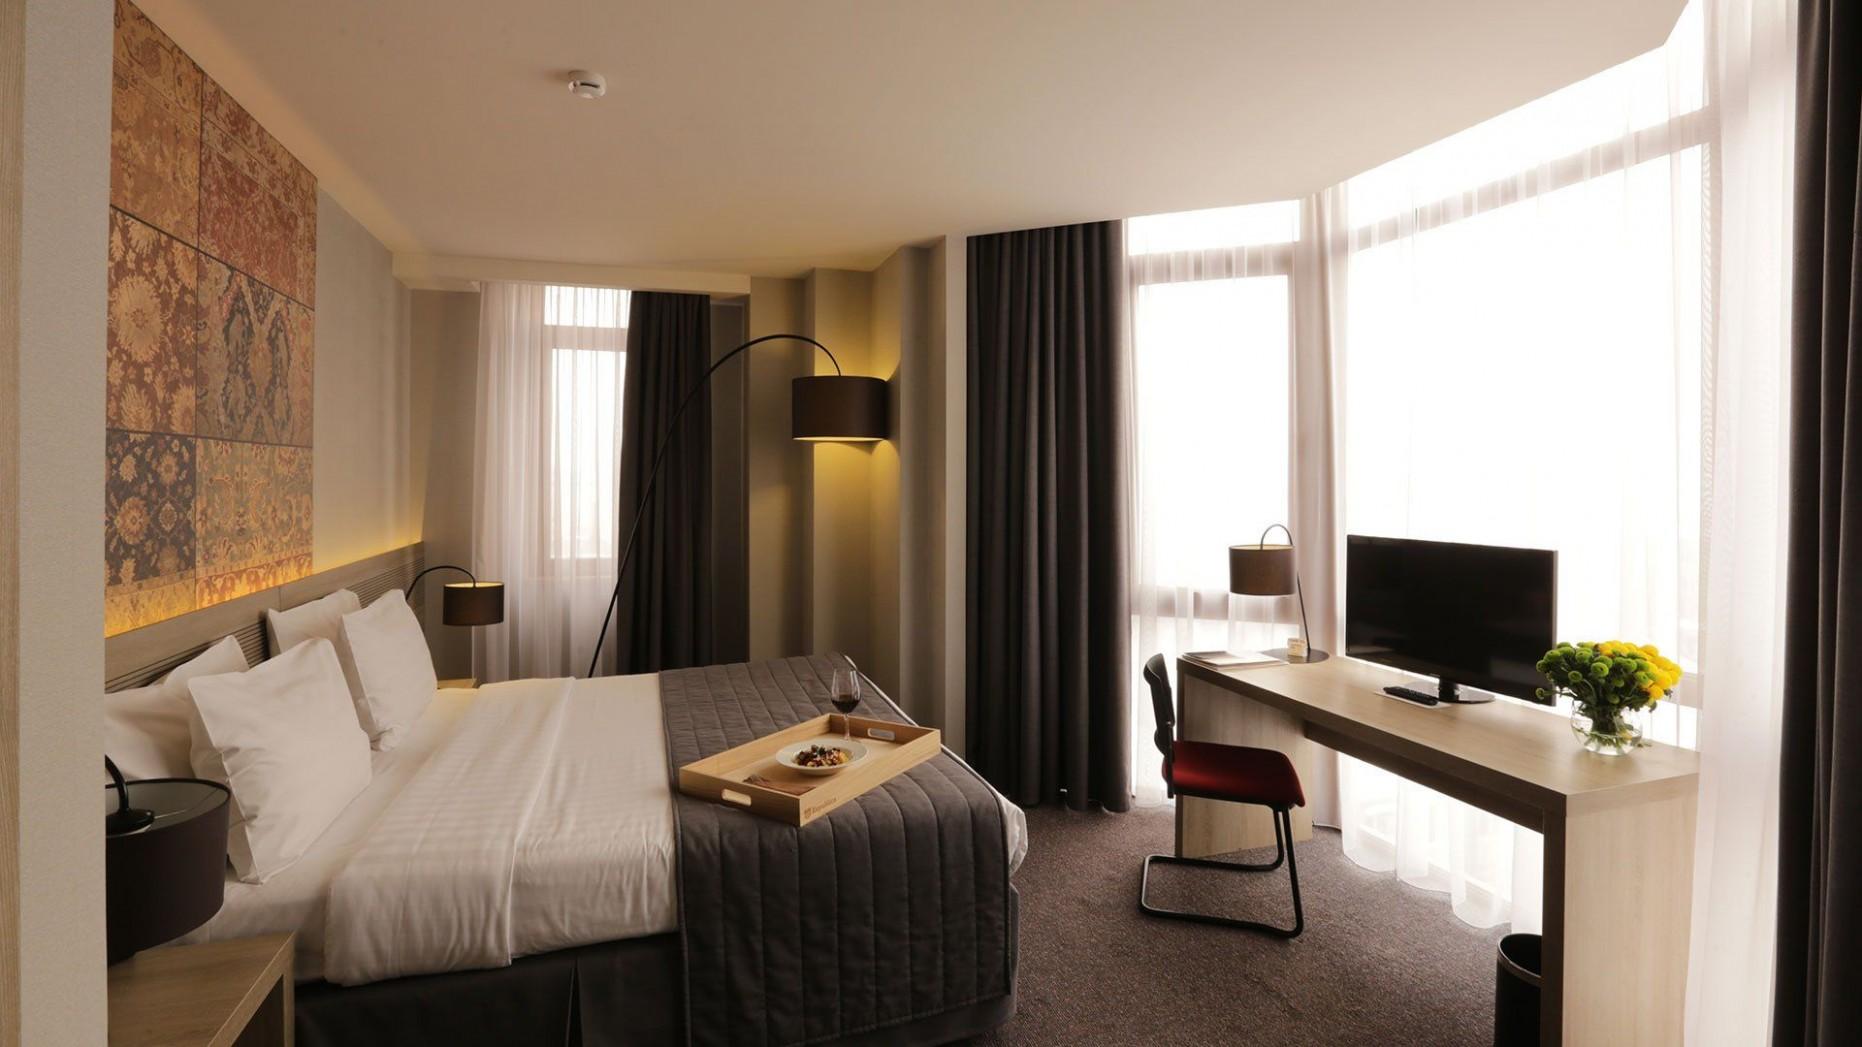 Deluxe Room - Republica Hotel Yerevan, Armenia - Image 10  Room  - Baby Room Yerevan